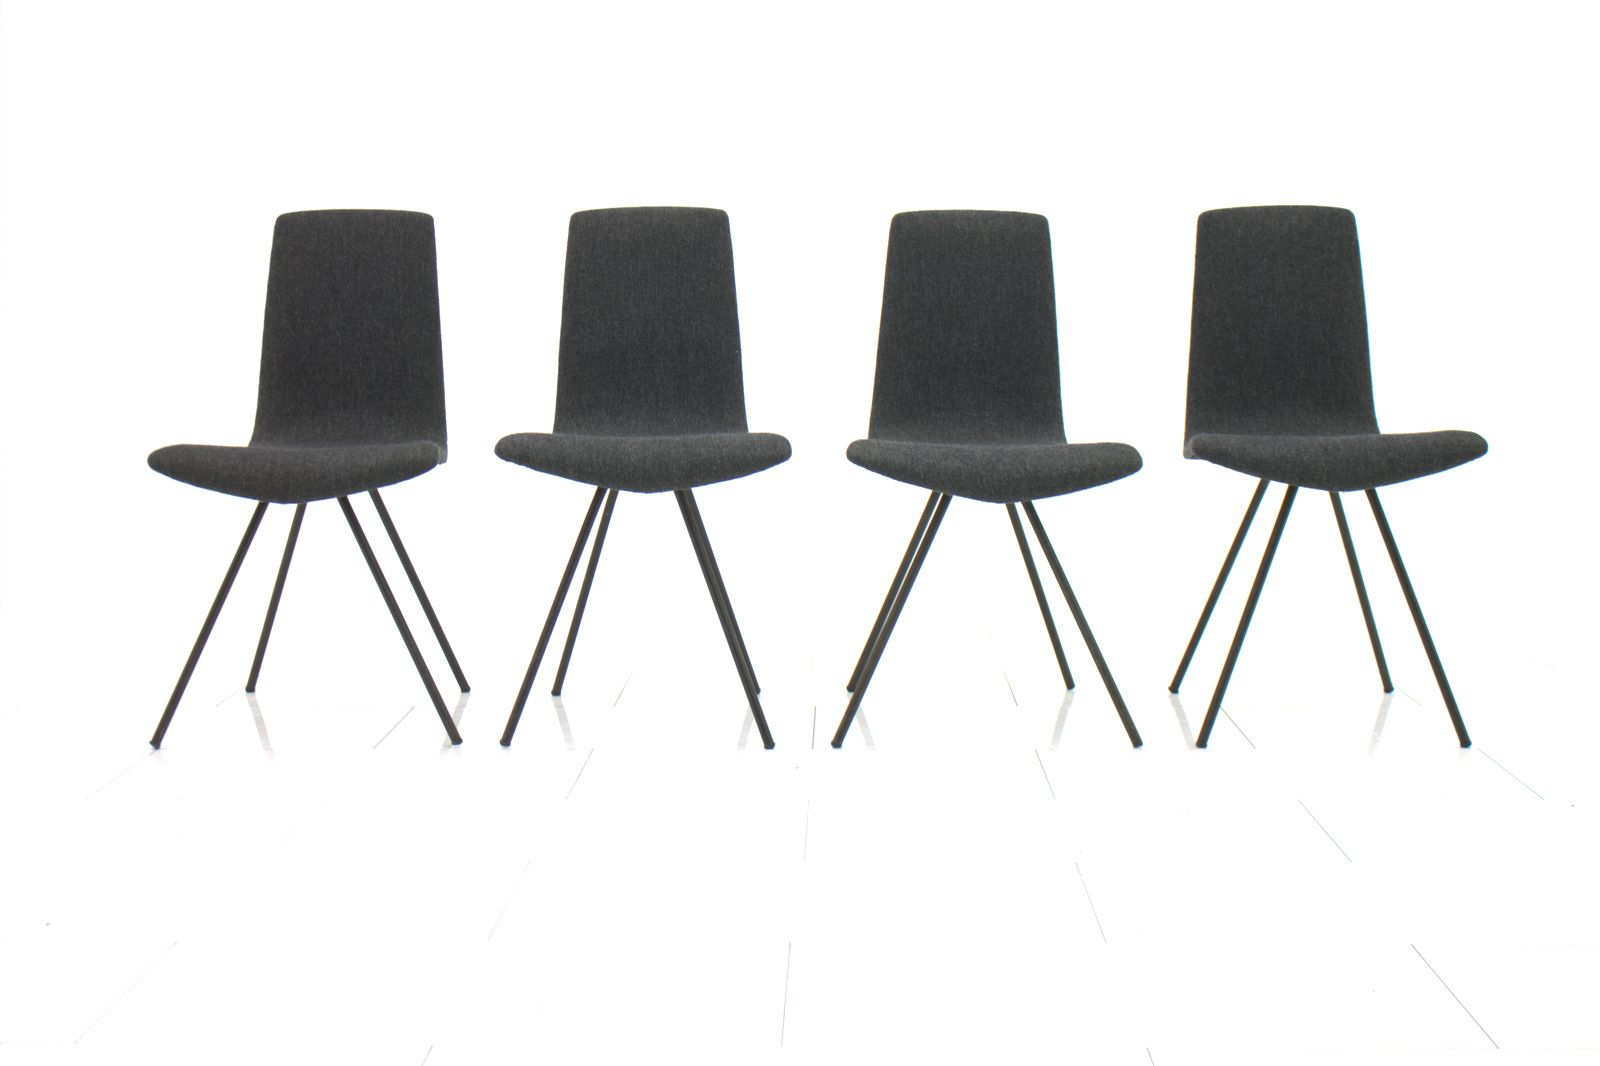 graue wohnzimmerst hle m belideen. Black Bedroom Furniture Sets. Home Design Ideas